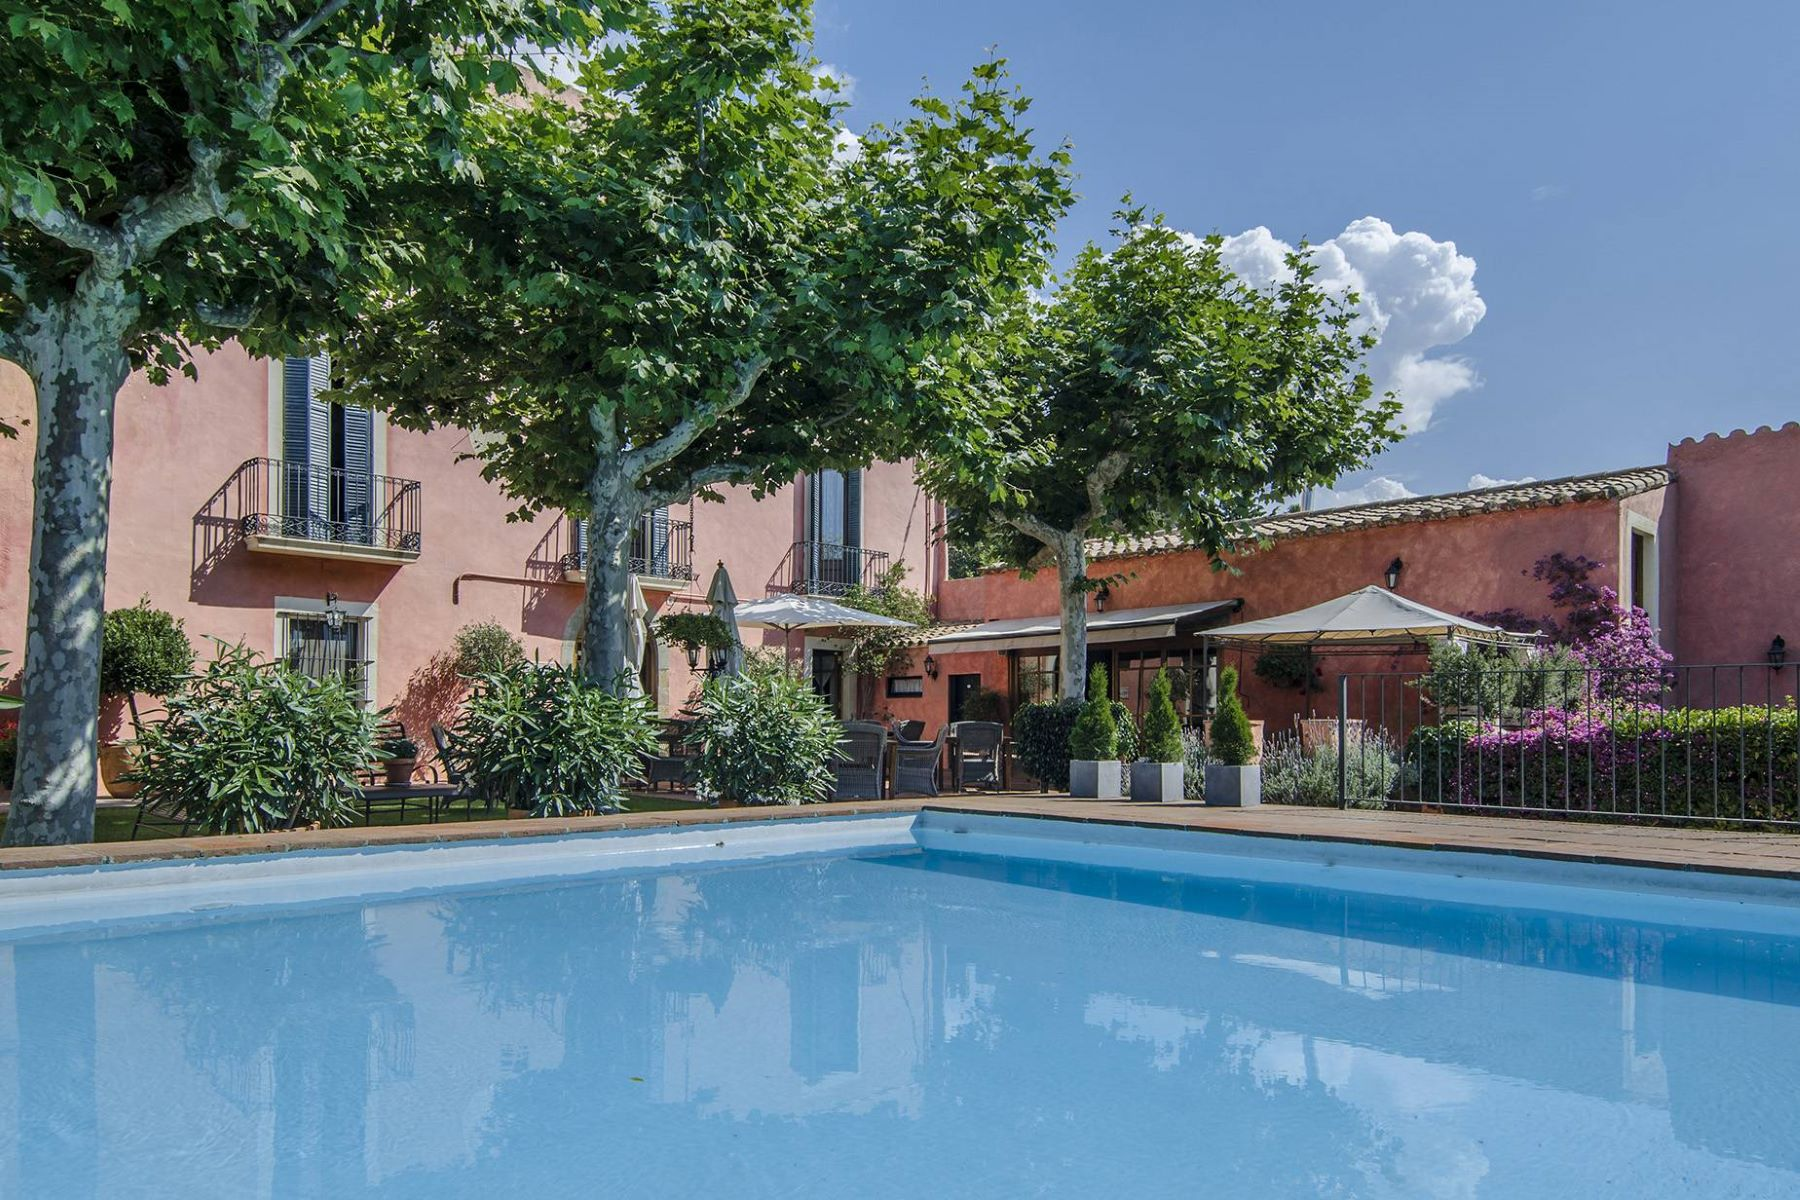 独户住宅 为 销售 在 Hotel and Residence in the Center of Cabrils 卡弗里尔斯, 巴塞罗那, 08348 西班牙